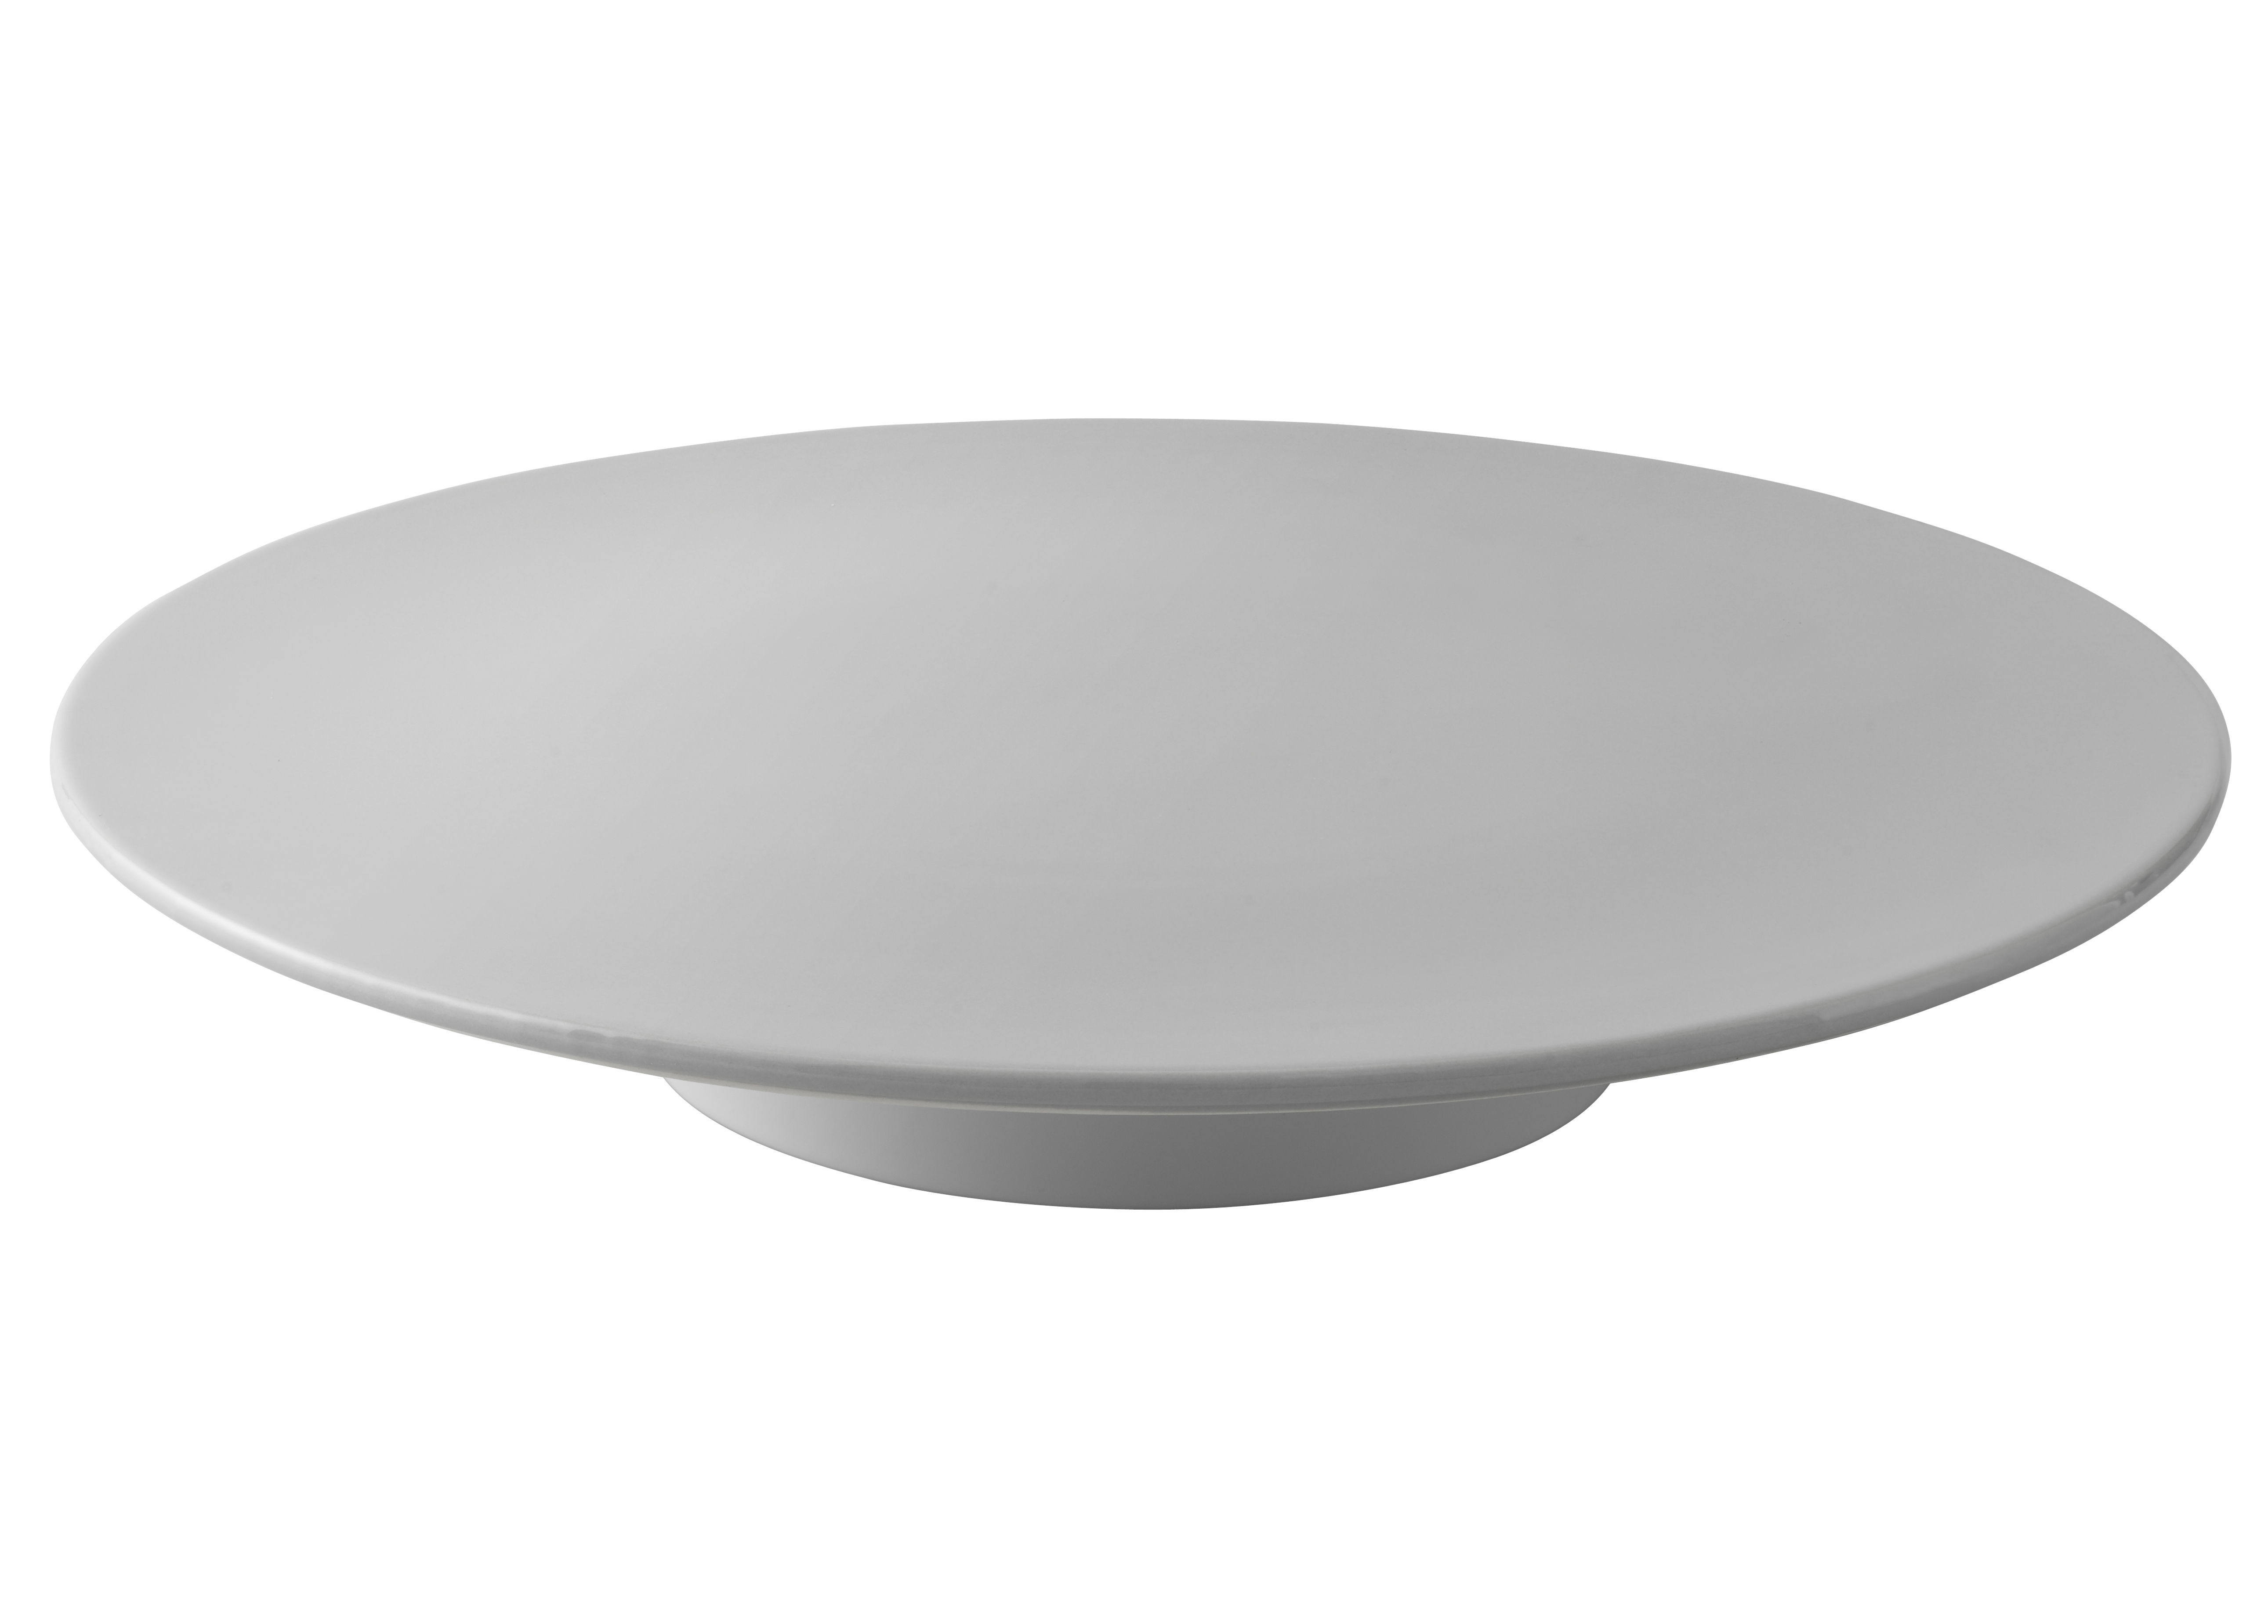 Tischkultur - Tabletts - Emma Kuchentablett / Ø 32,5 cm - Stelton - Hellgrau - emaillierte Keramik